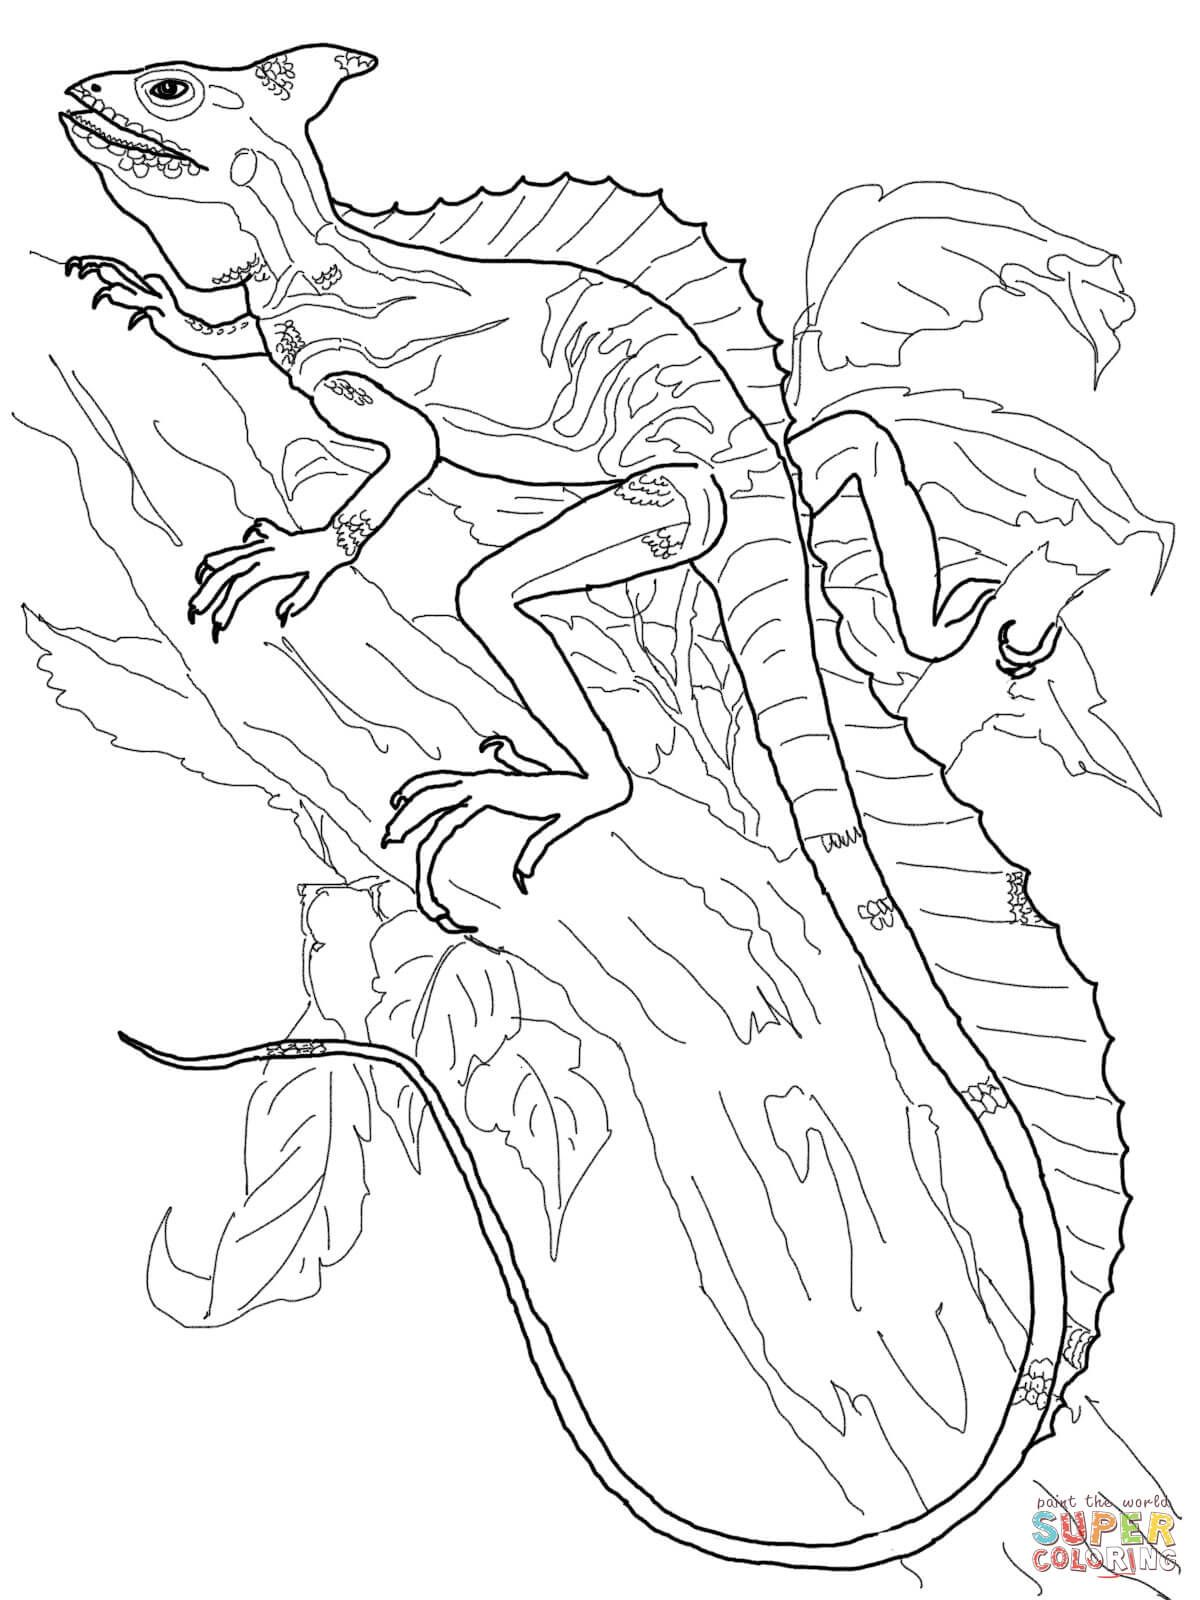 Basilisk Lizard Coloring Page Free Printable Coloring Pages Coloring Pages Animal Coloring Pages Basilisk Lizard